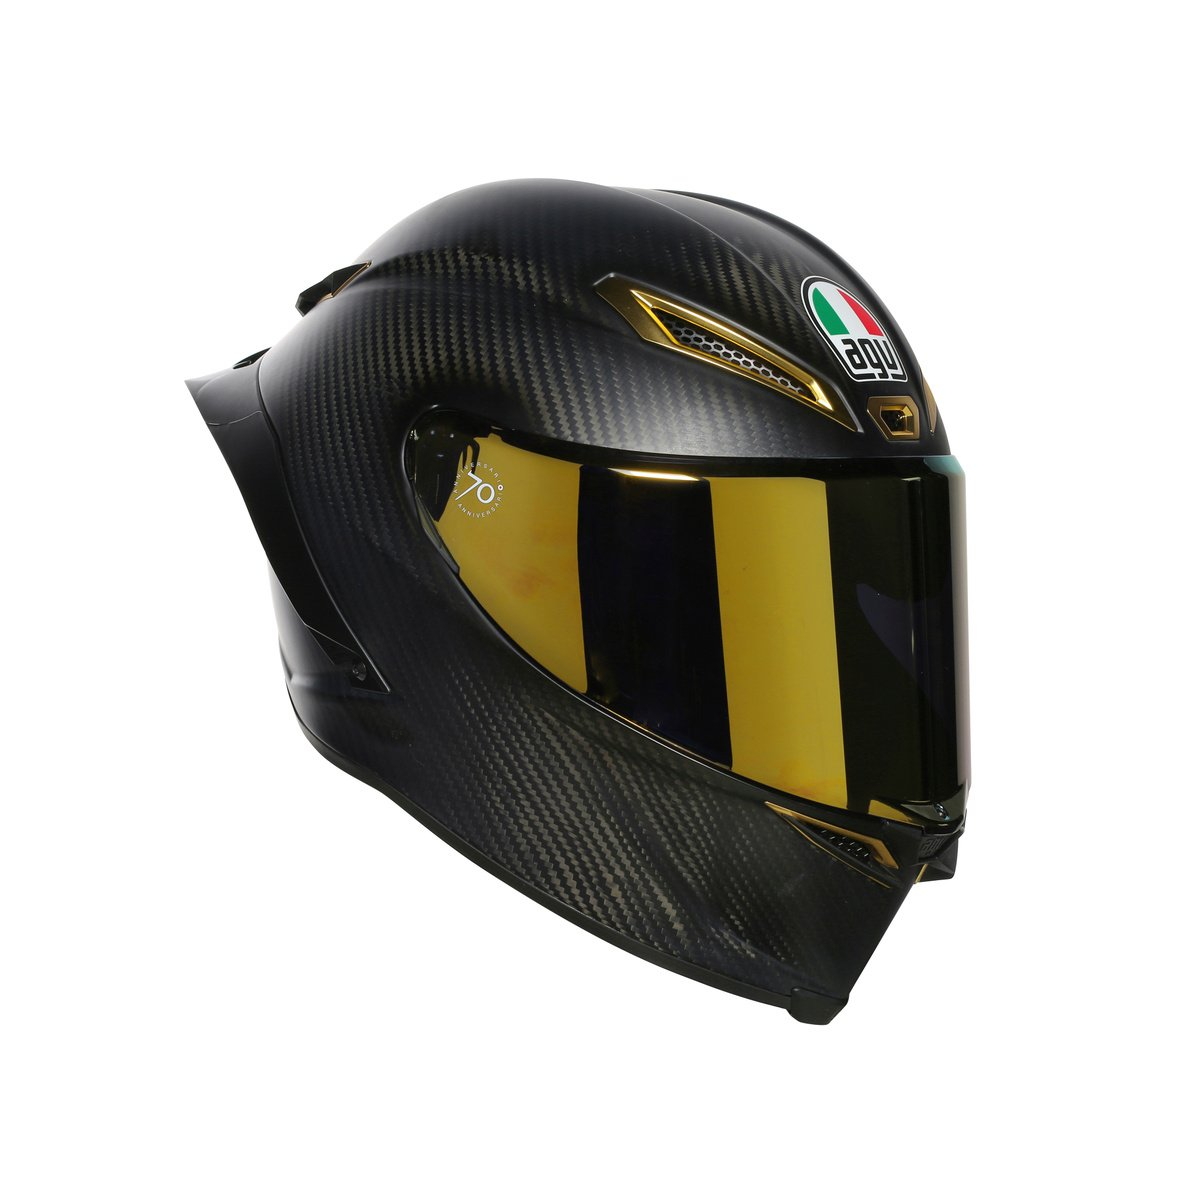 amazon com agv pista gp r carbon anniversario helmet s automotive